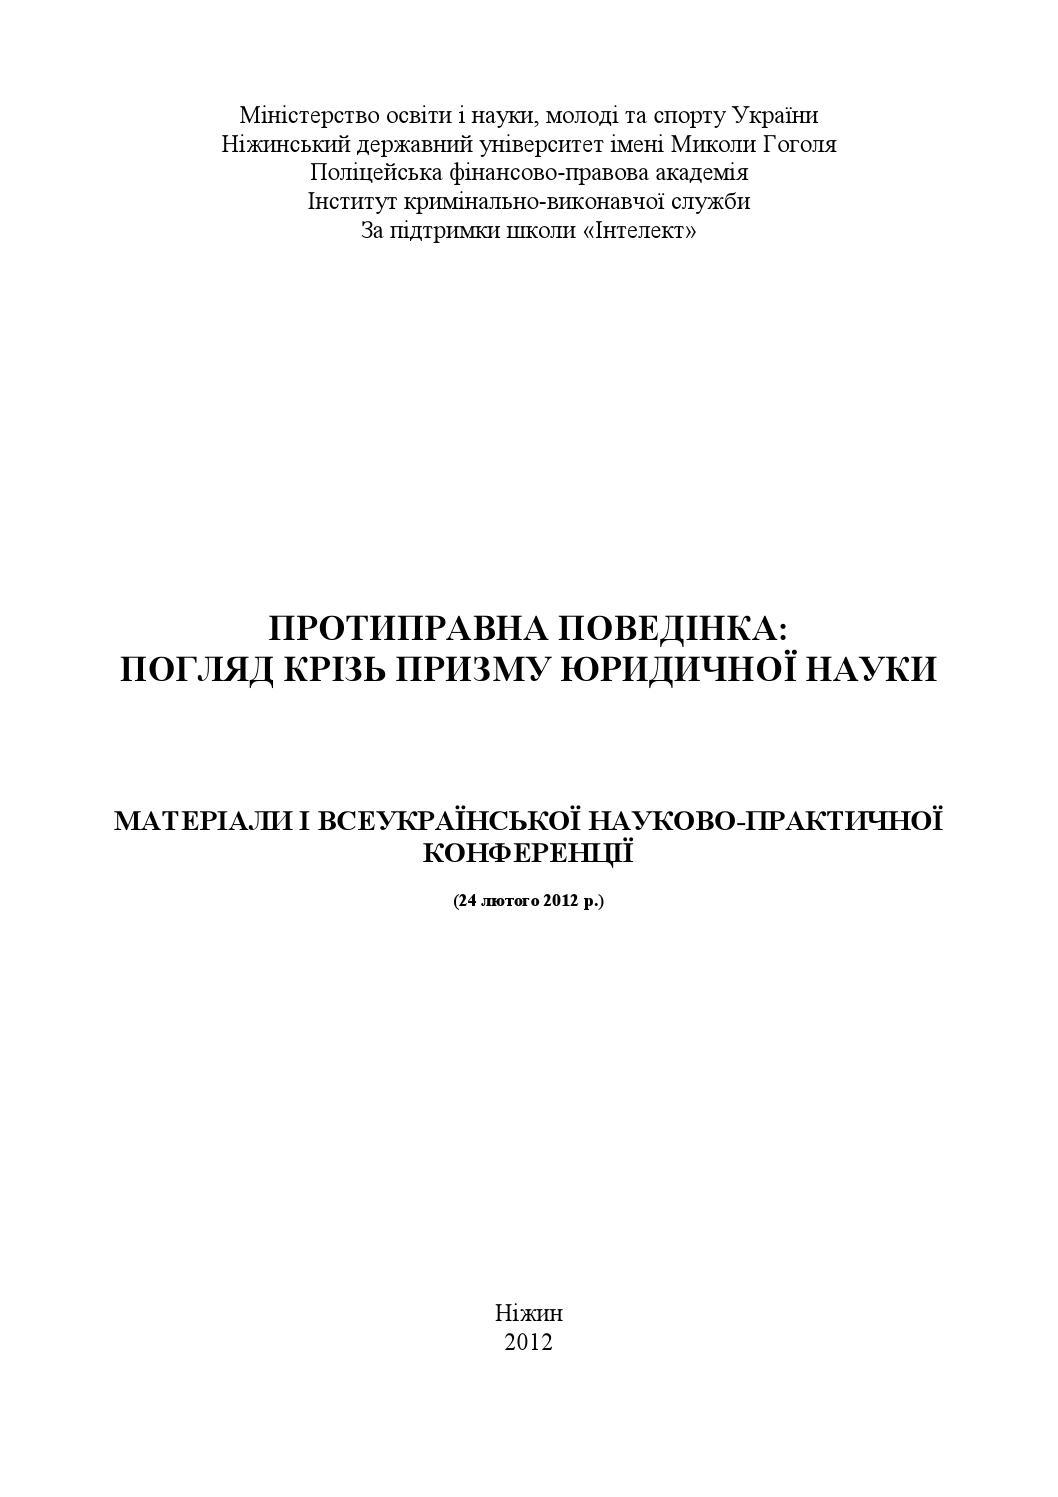 Невиробнича травма пояснювальна записка зразокdoc